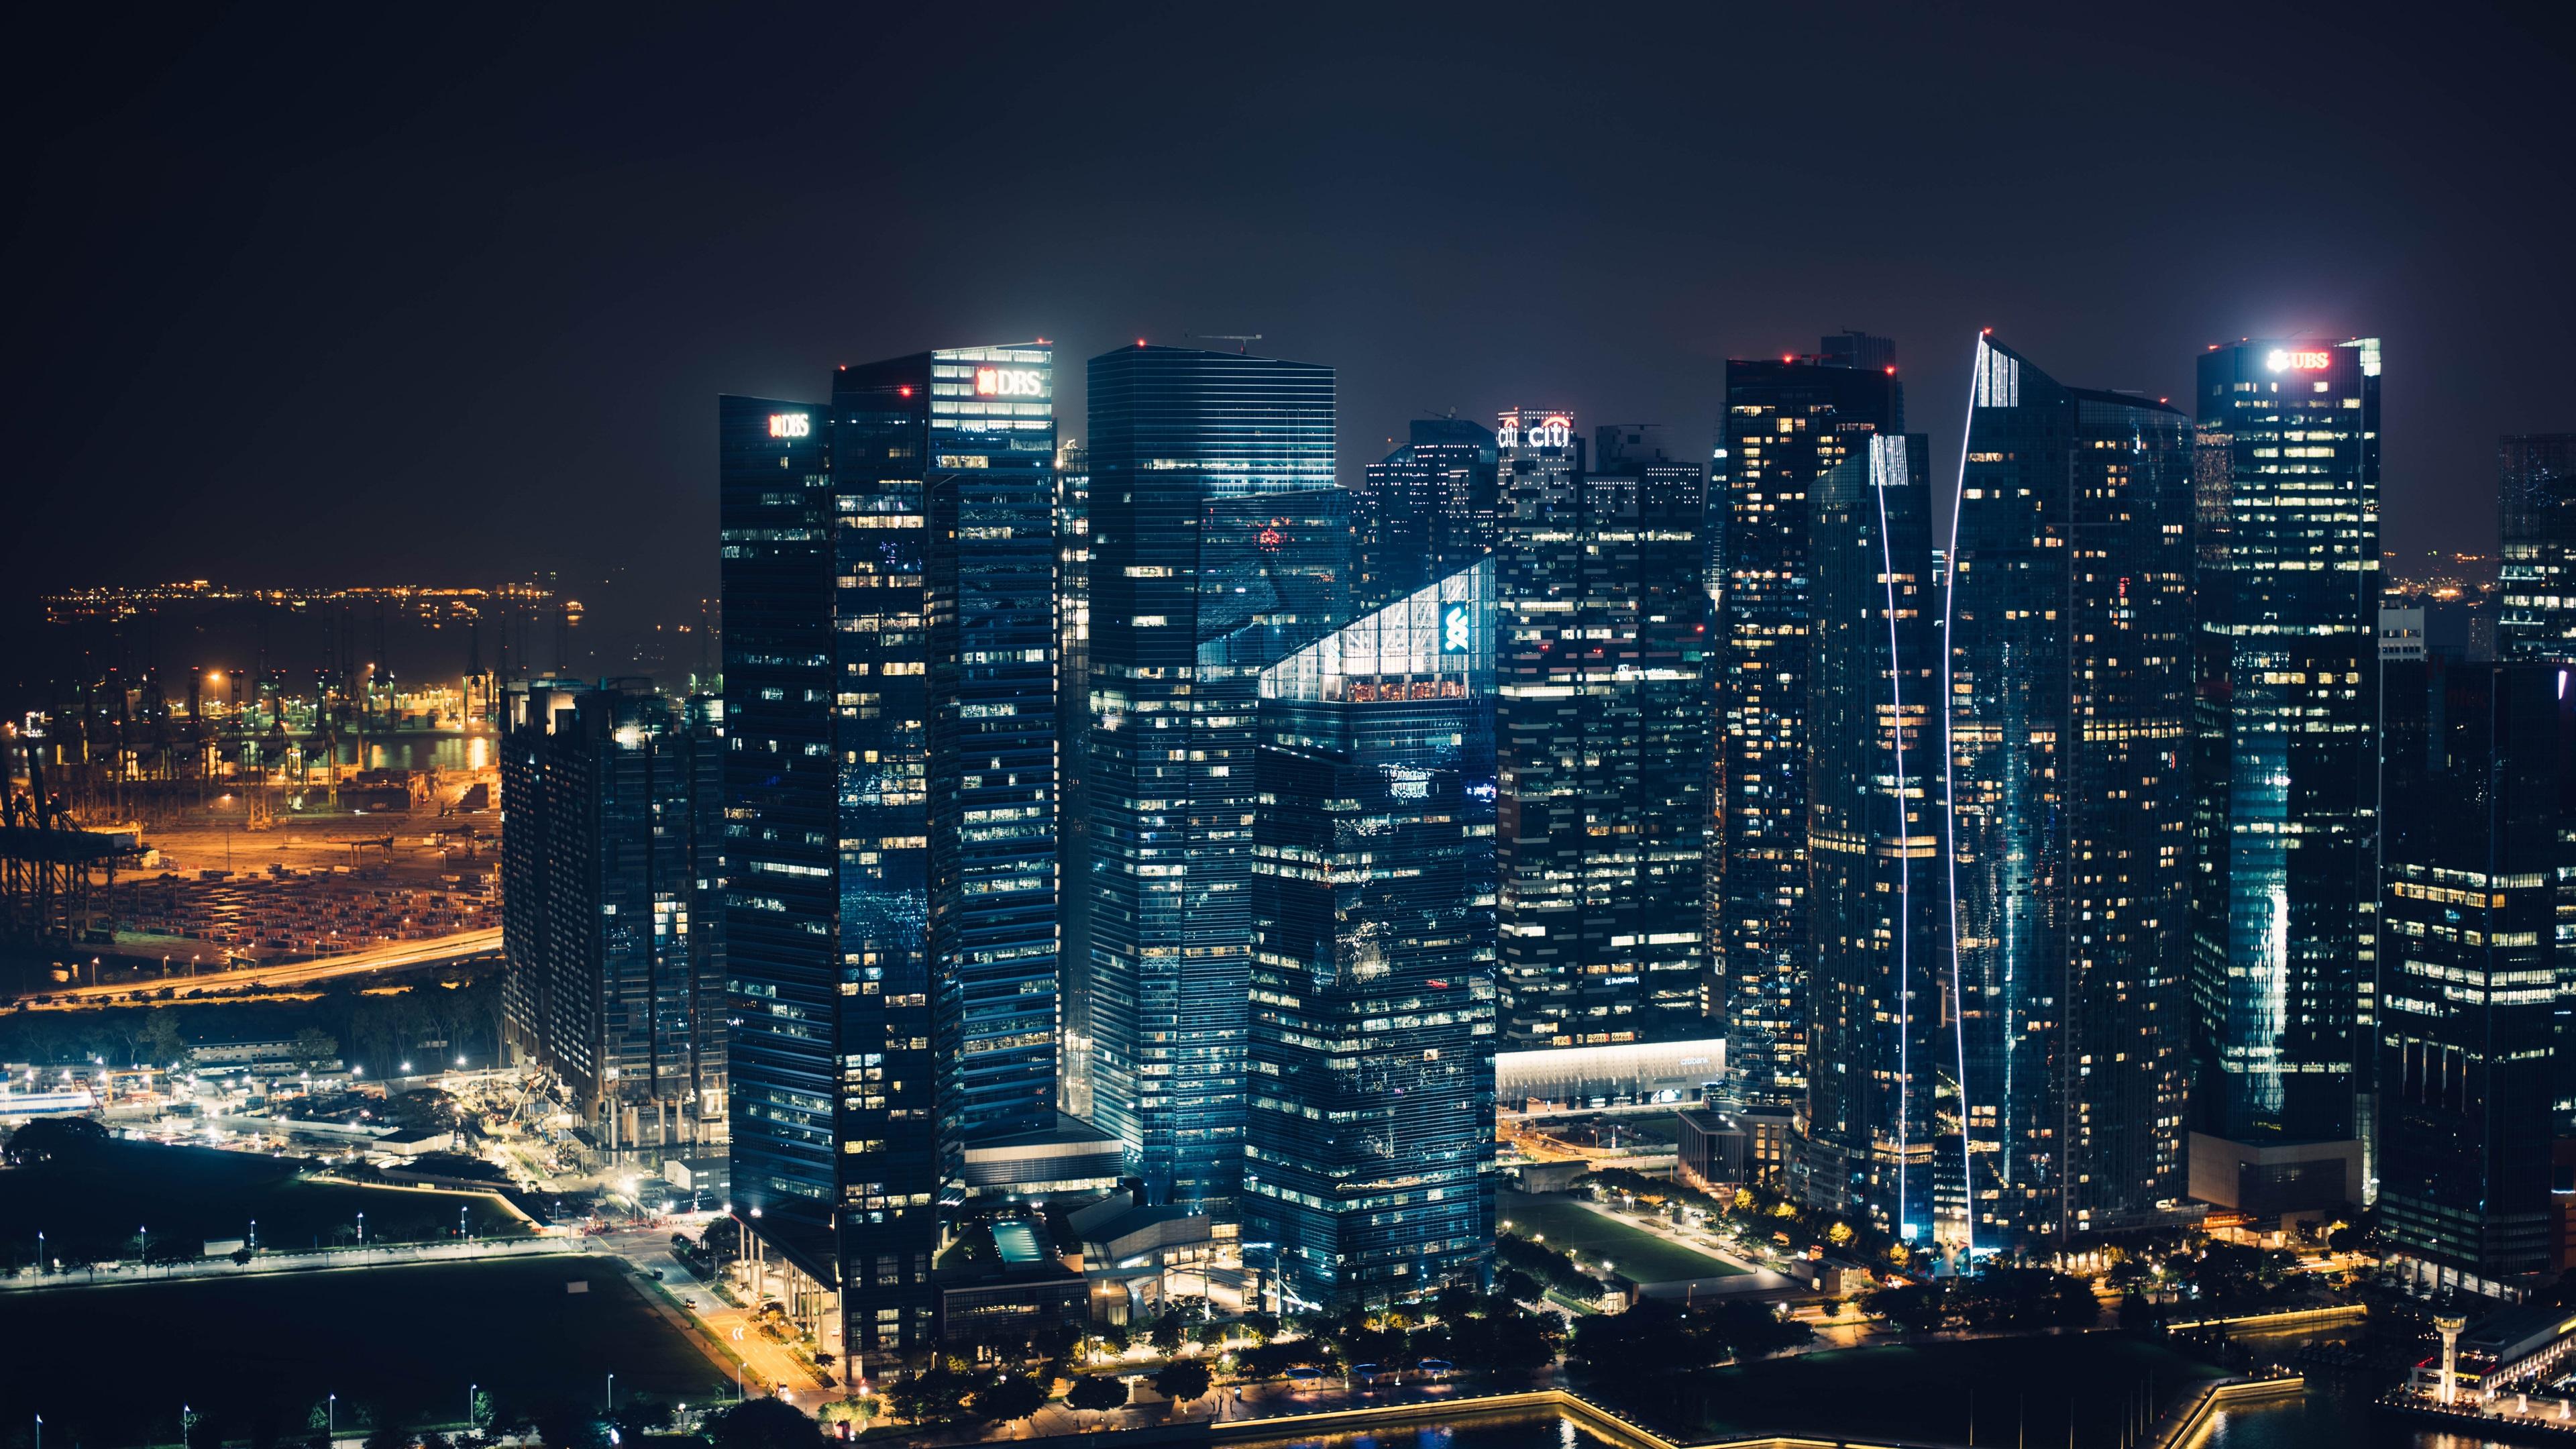 wallpaper skyscrapers, lights, city, night view 3840x2160 uhd 4k